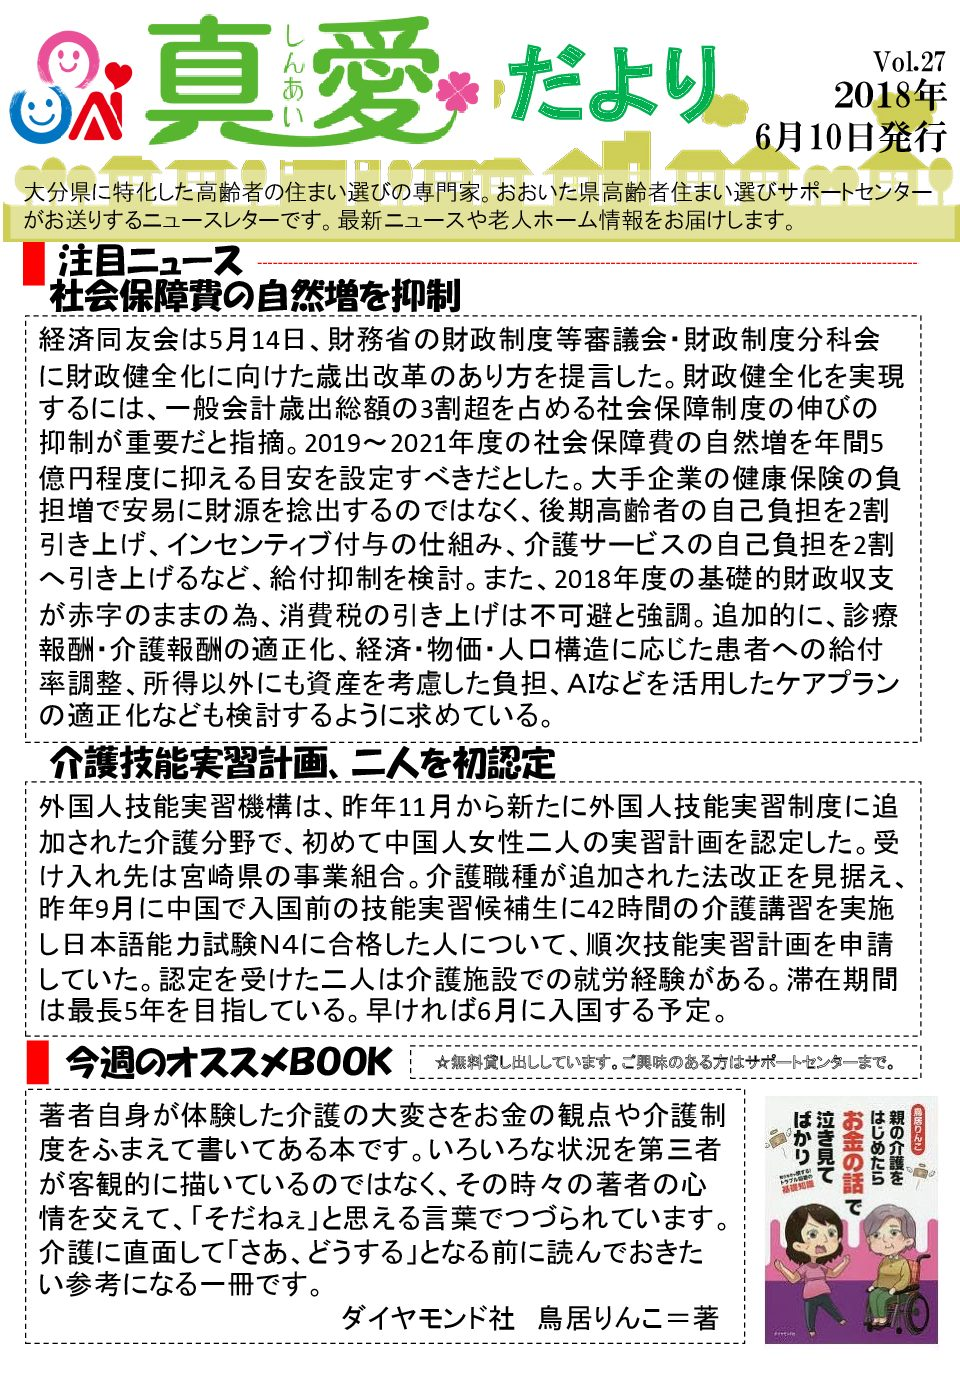 【Vol.27】 2018.06.10発行